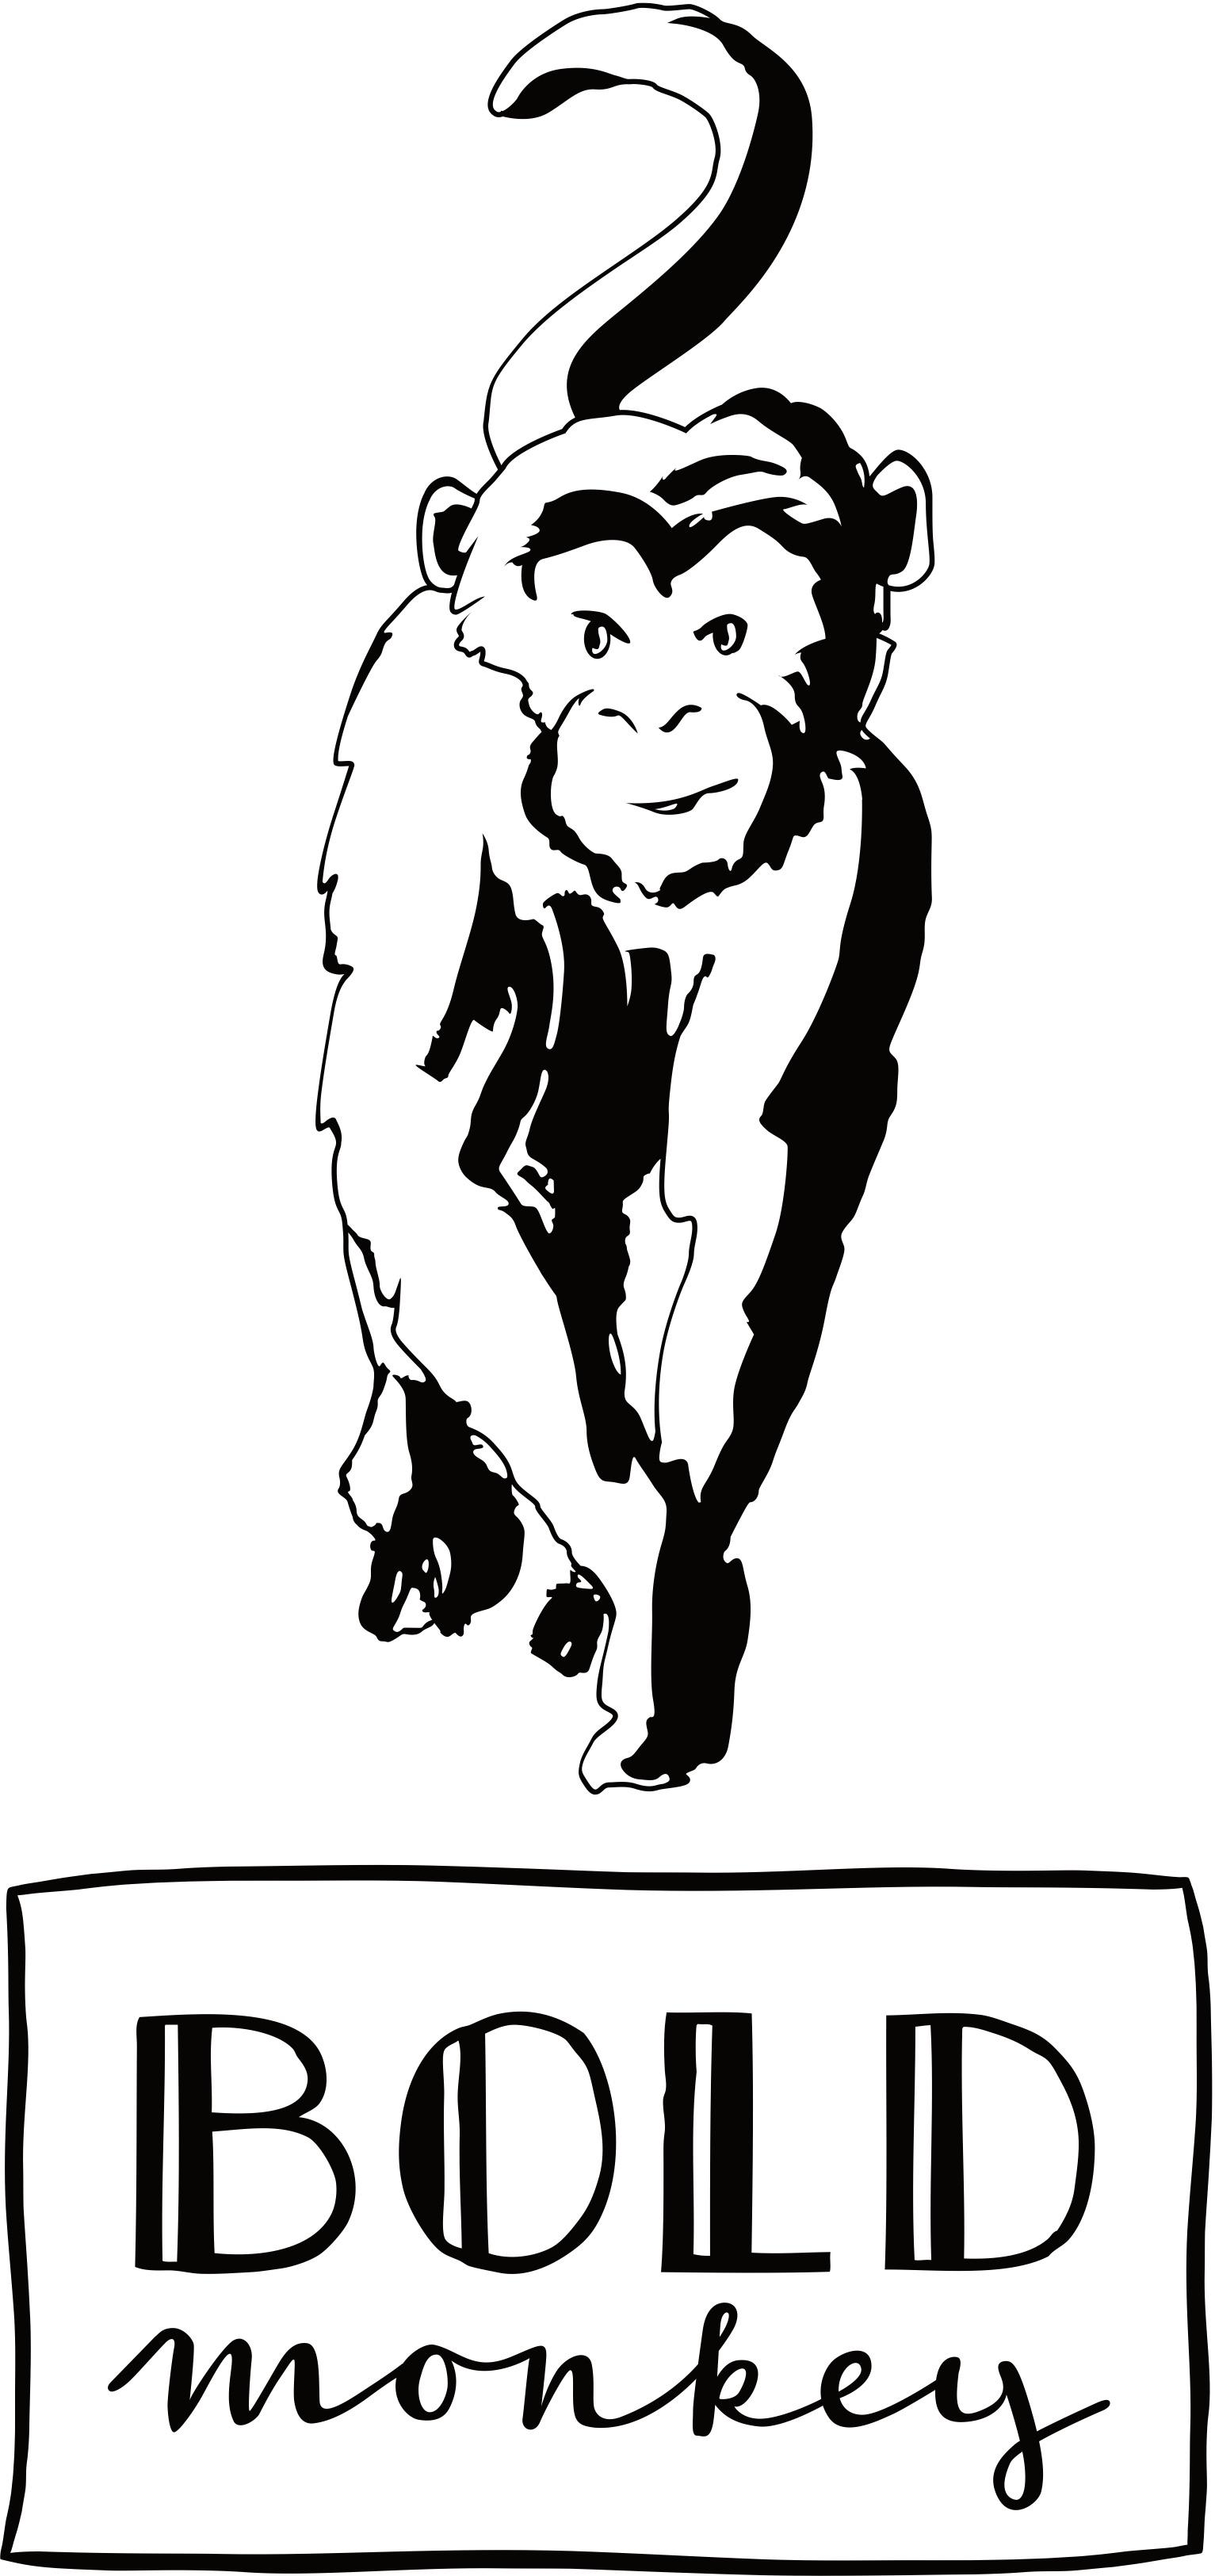 Bold Monkey too pretty to sit on bank rond velvet roze gouden onderstel zijaanzicht